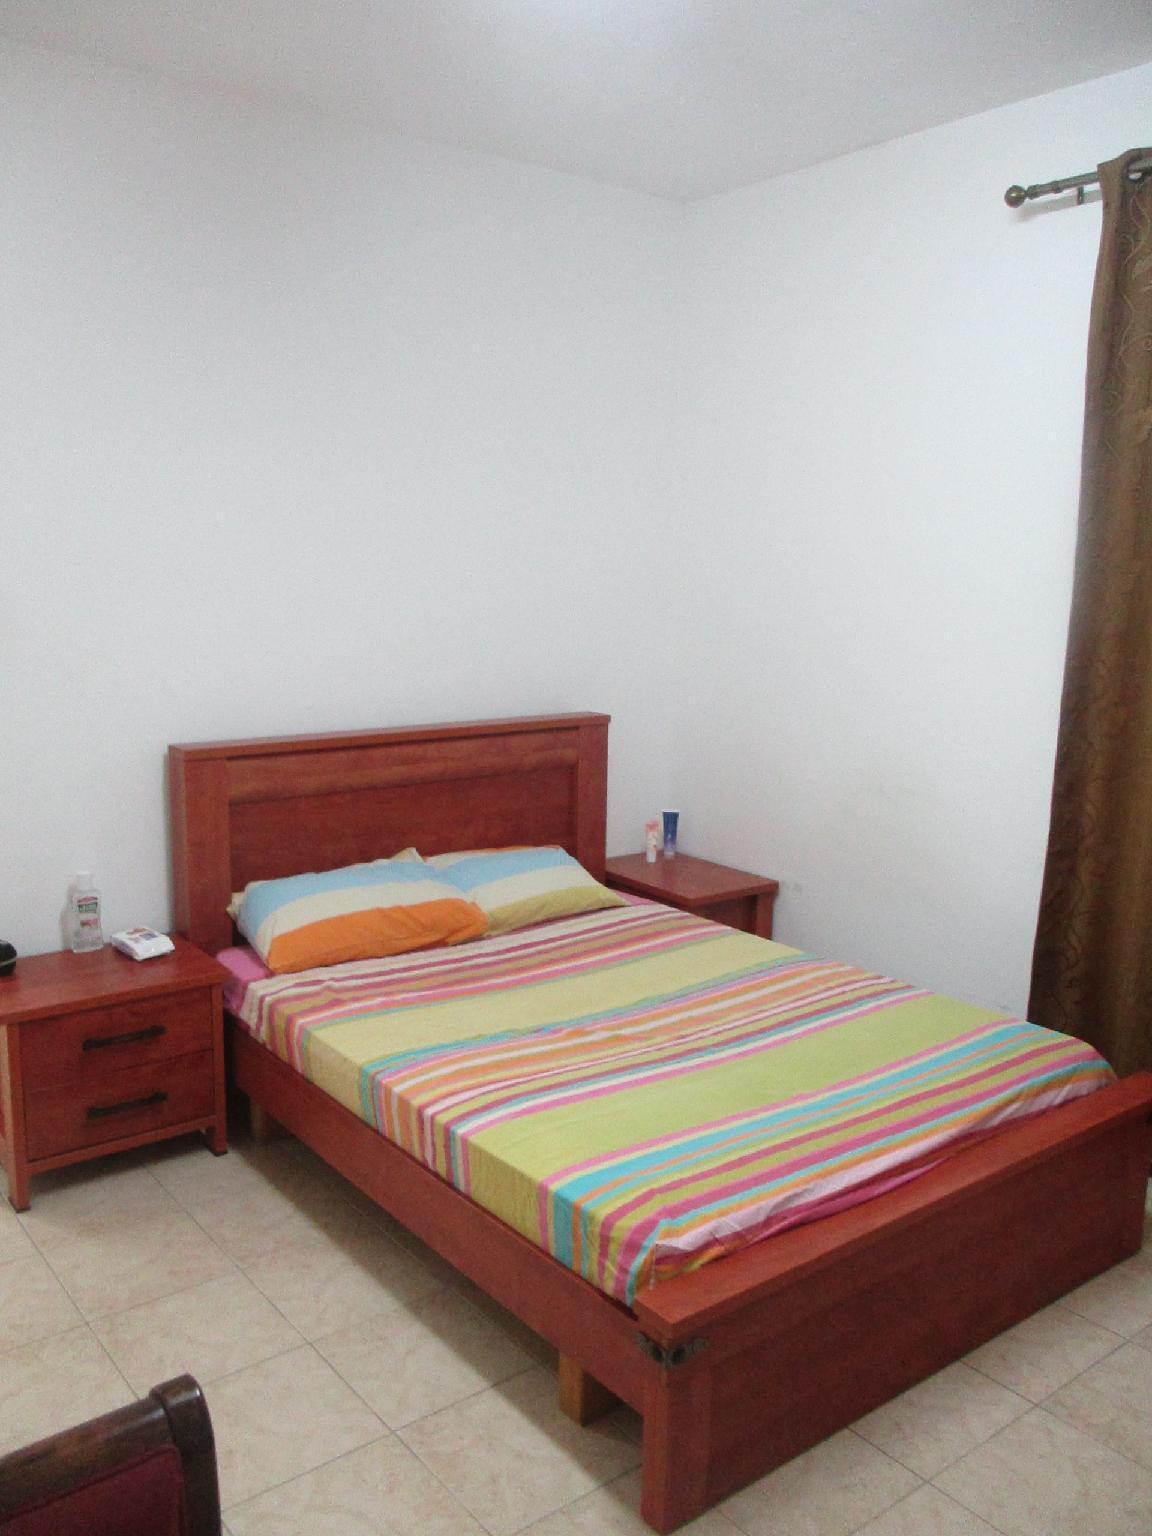 One-bedroom apartment (sea, hospital Rambam)